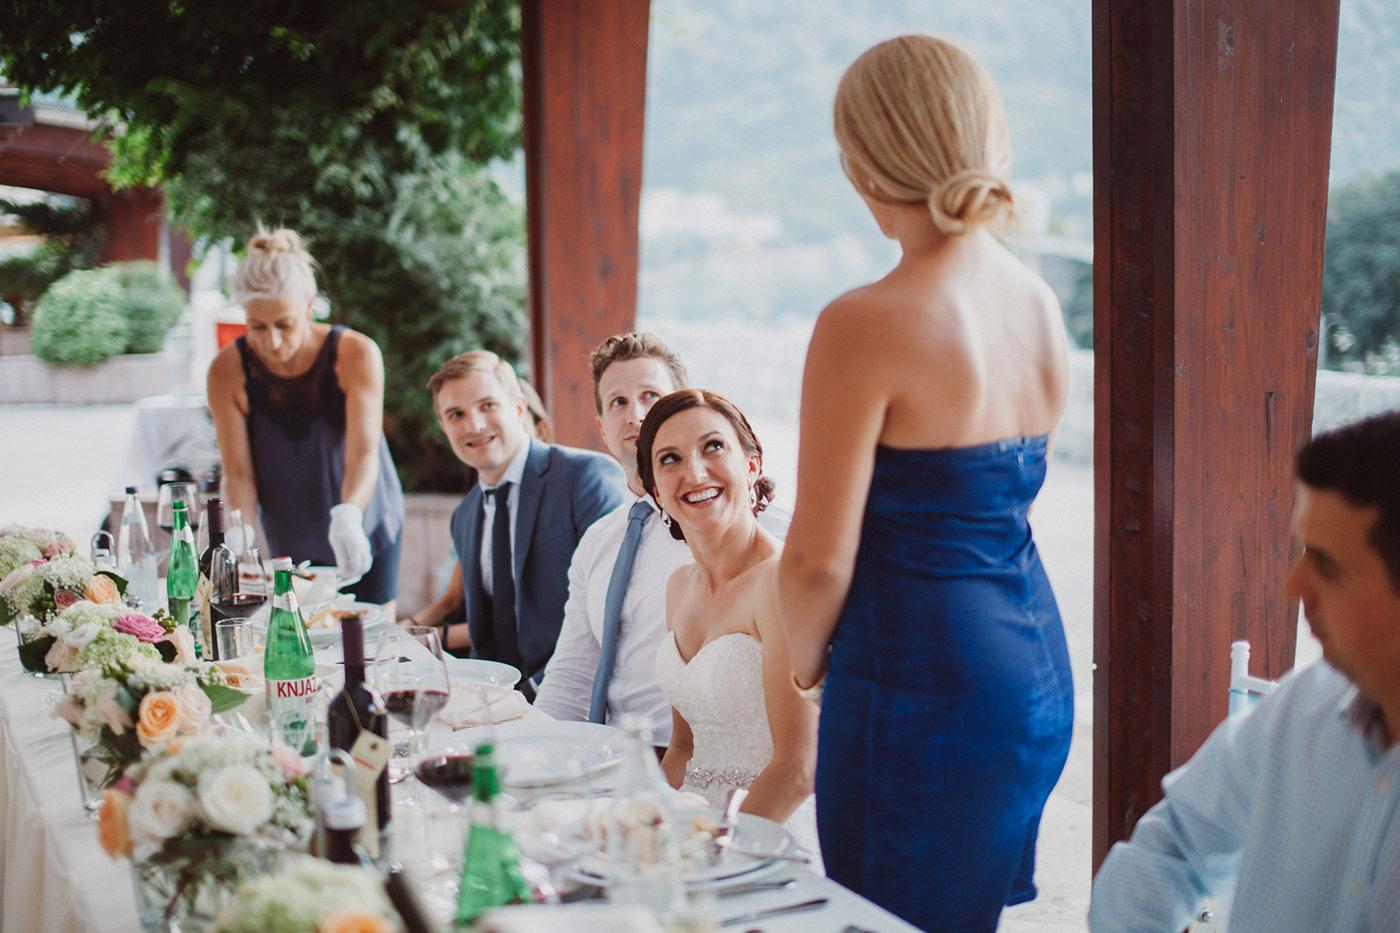 irena-ryan-destination-wedding-photographer-montenegro-kotor-0146